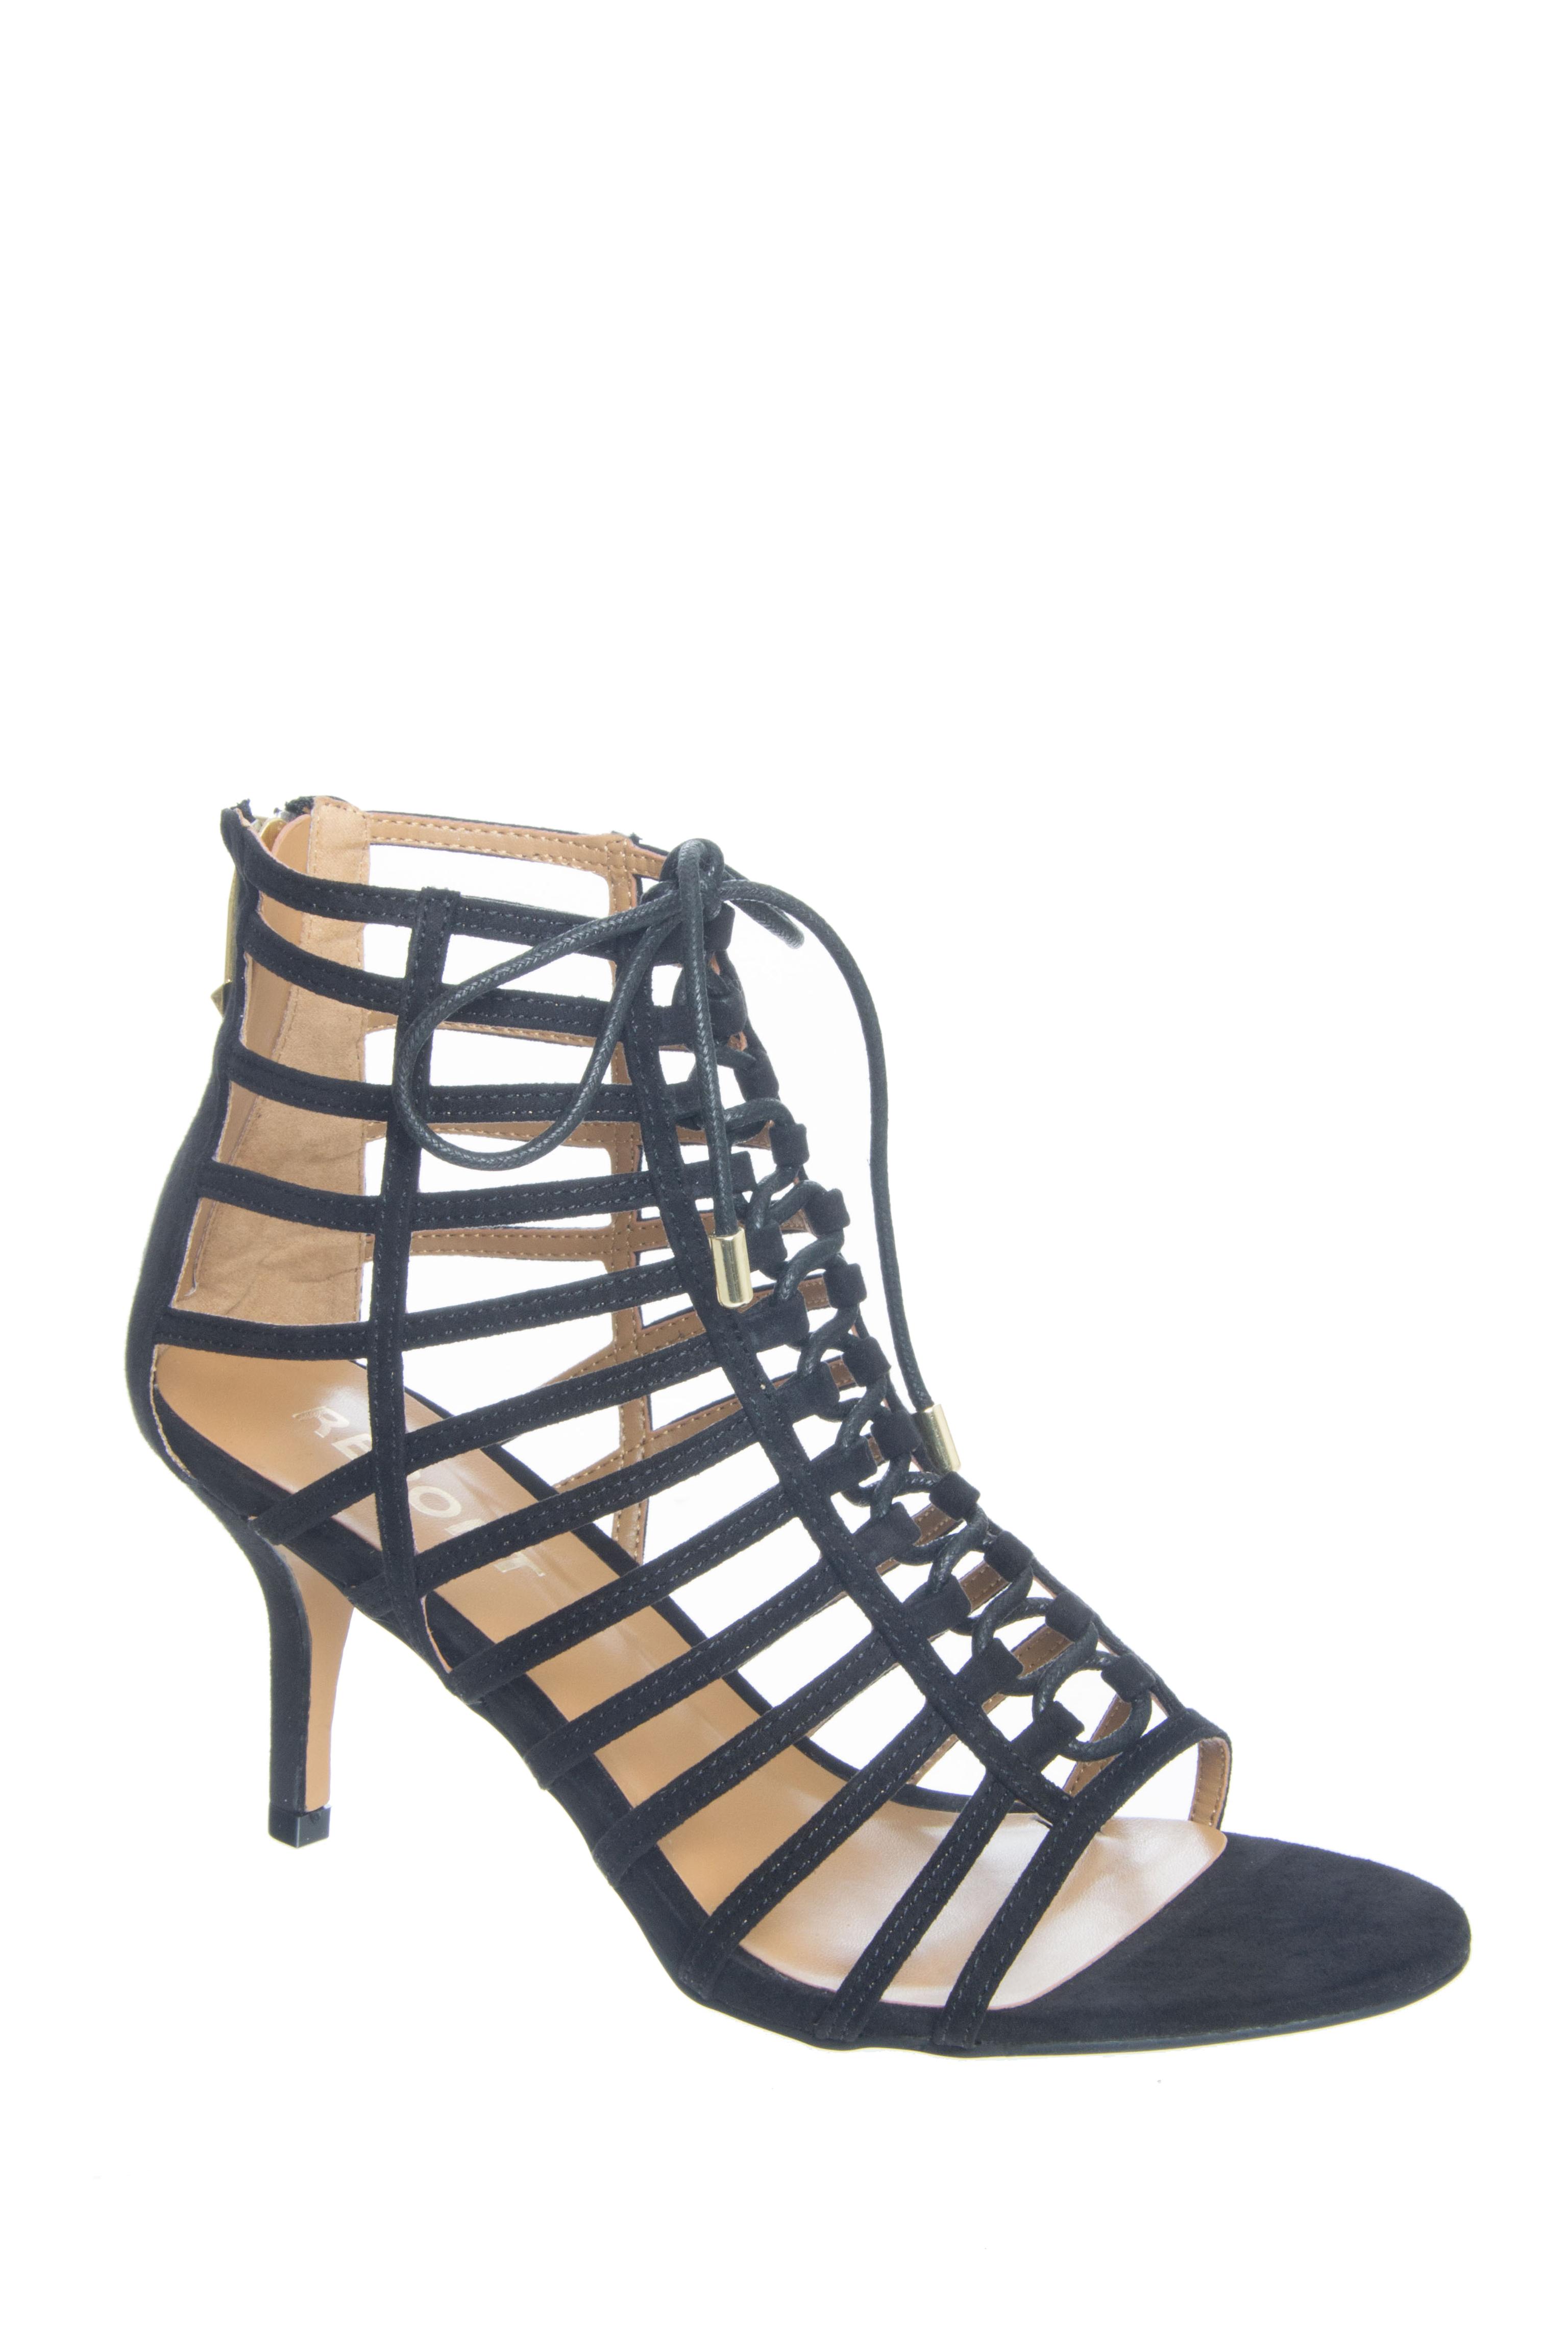 Report Berner Caged Low Heel Sandals - Black